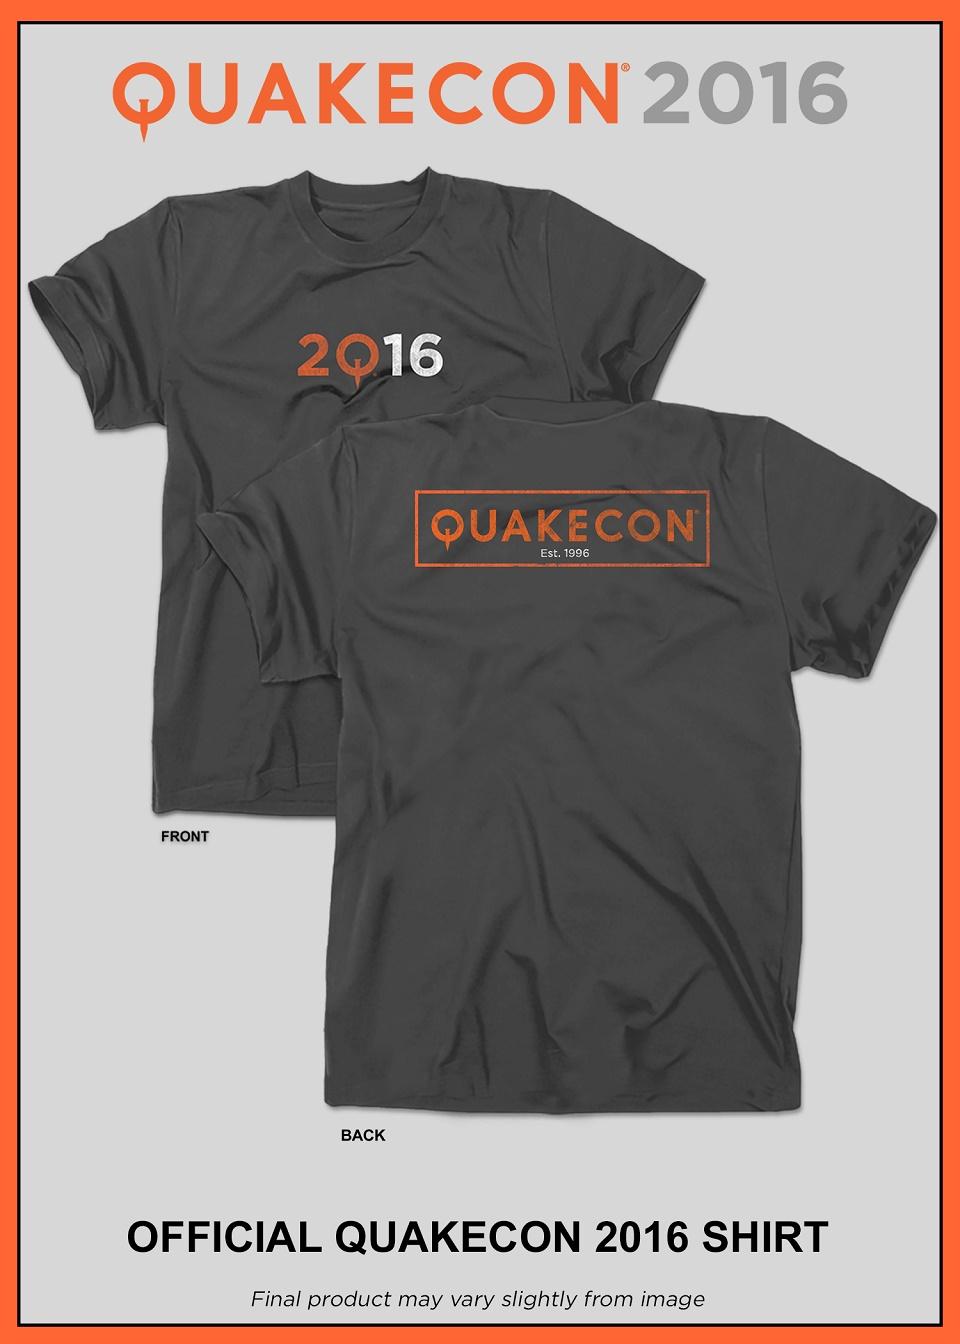 2016QC_Official_Shirt_For_Web.jpg